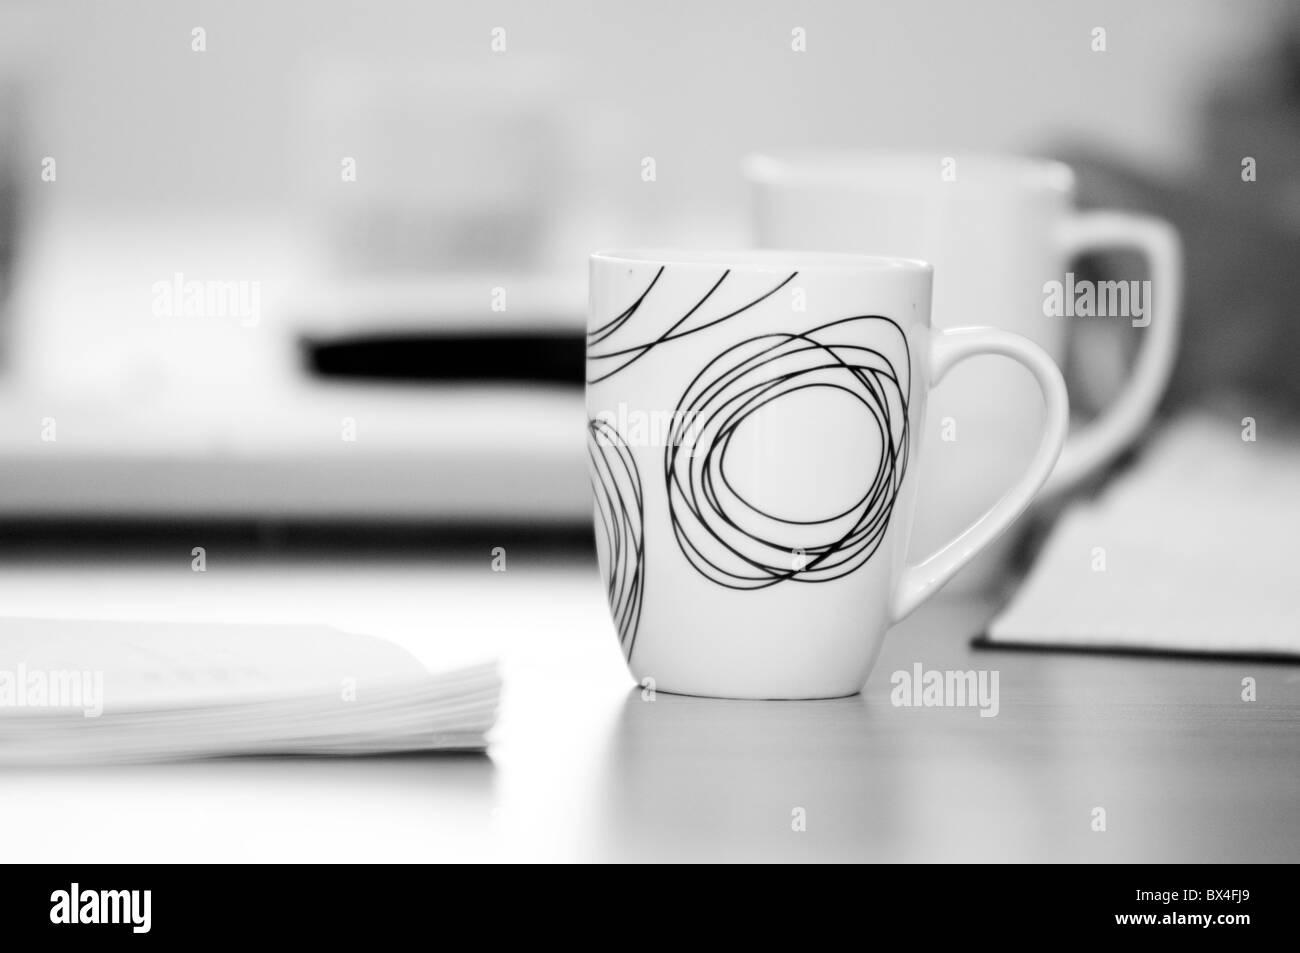 Coffee Mug Mugs Cups Cup Break Tea Refreshments Business Meeting Stock Photo Alamy